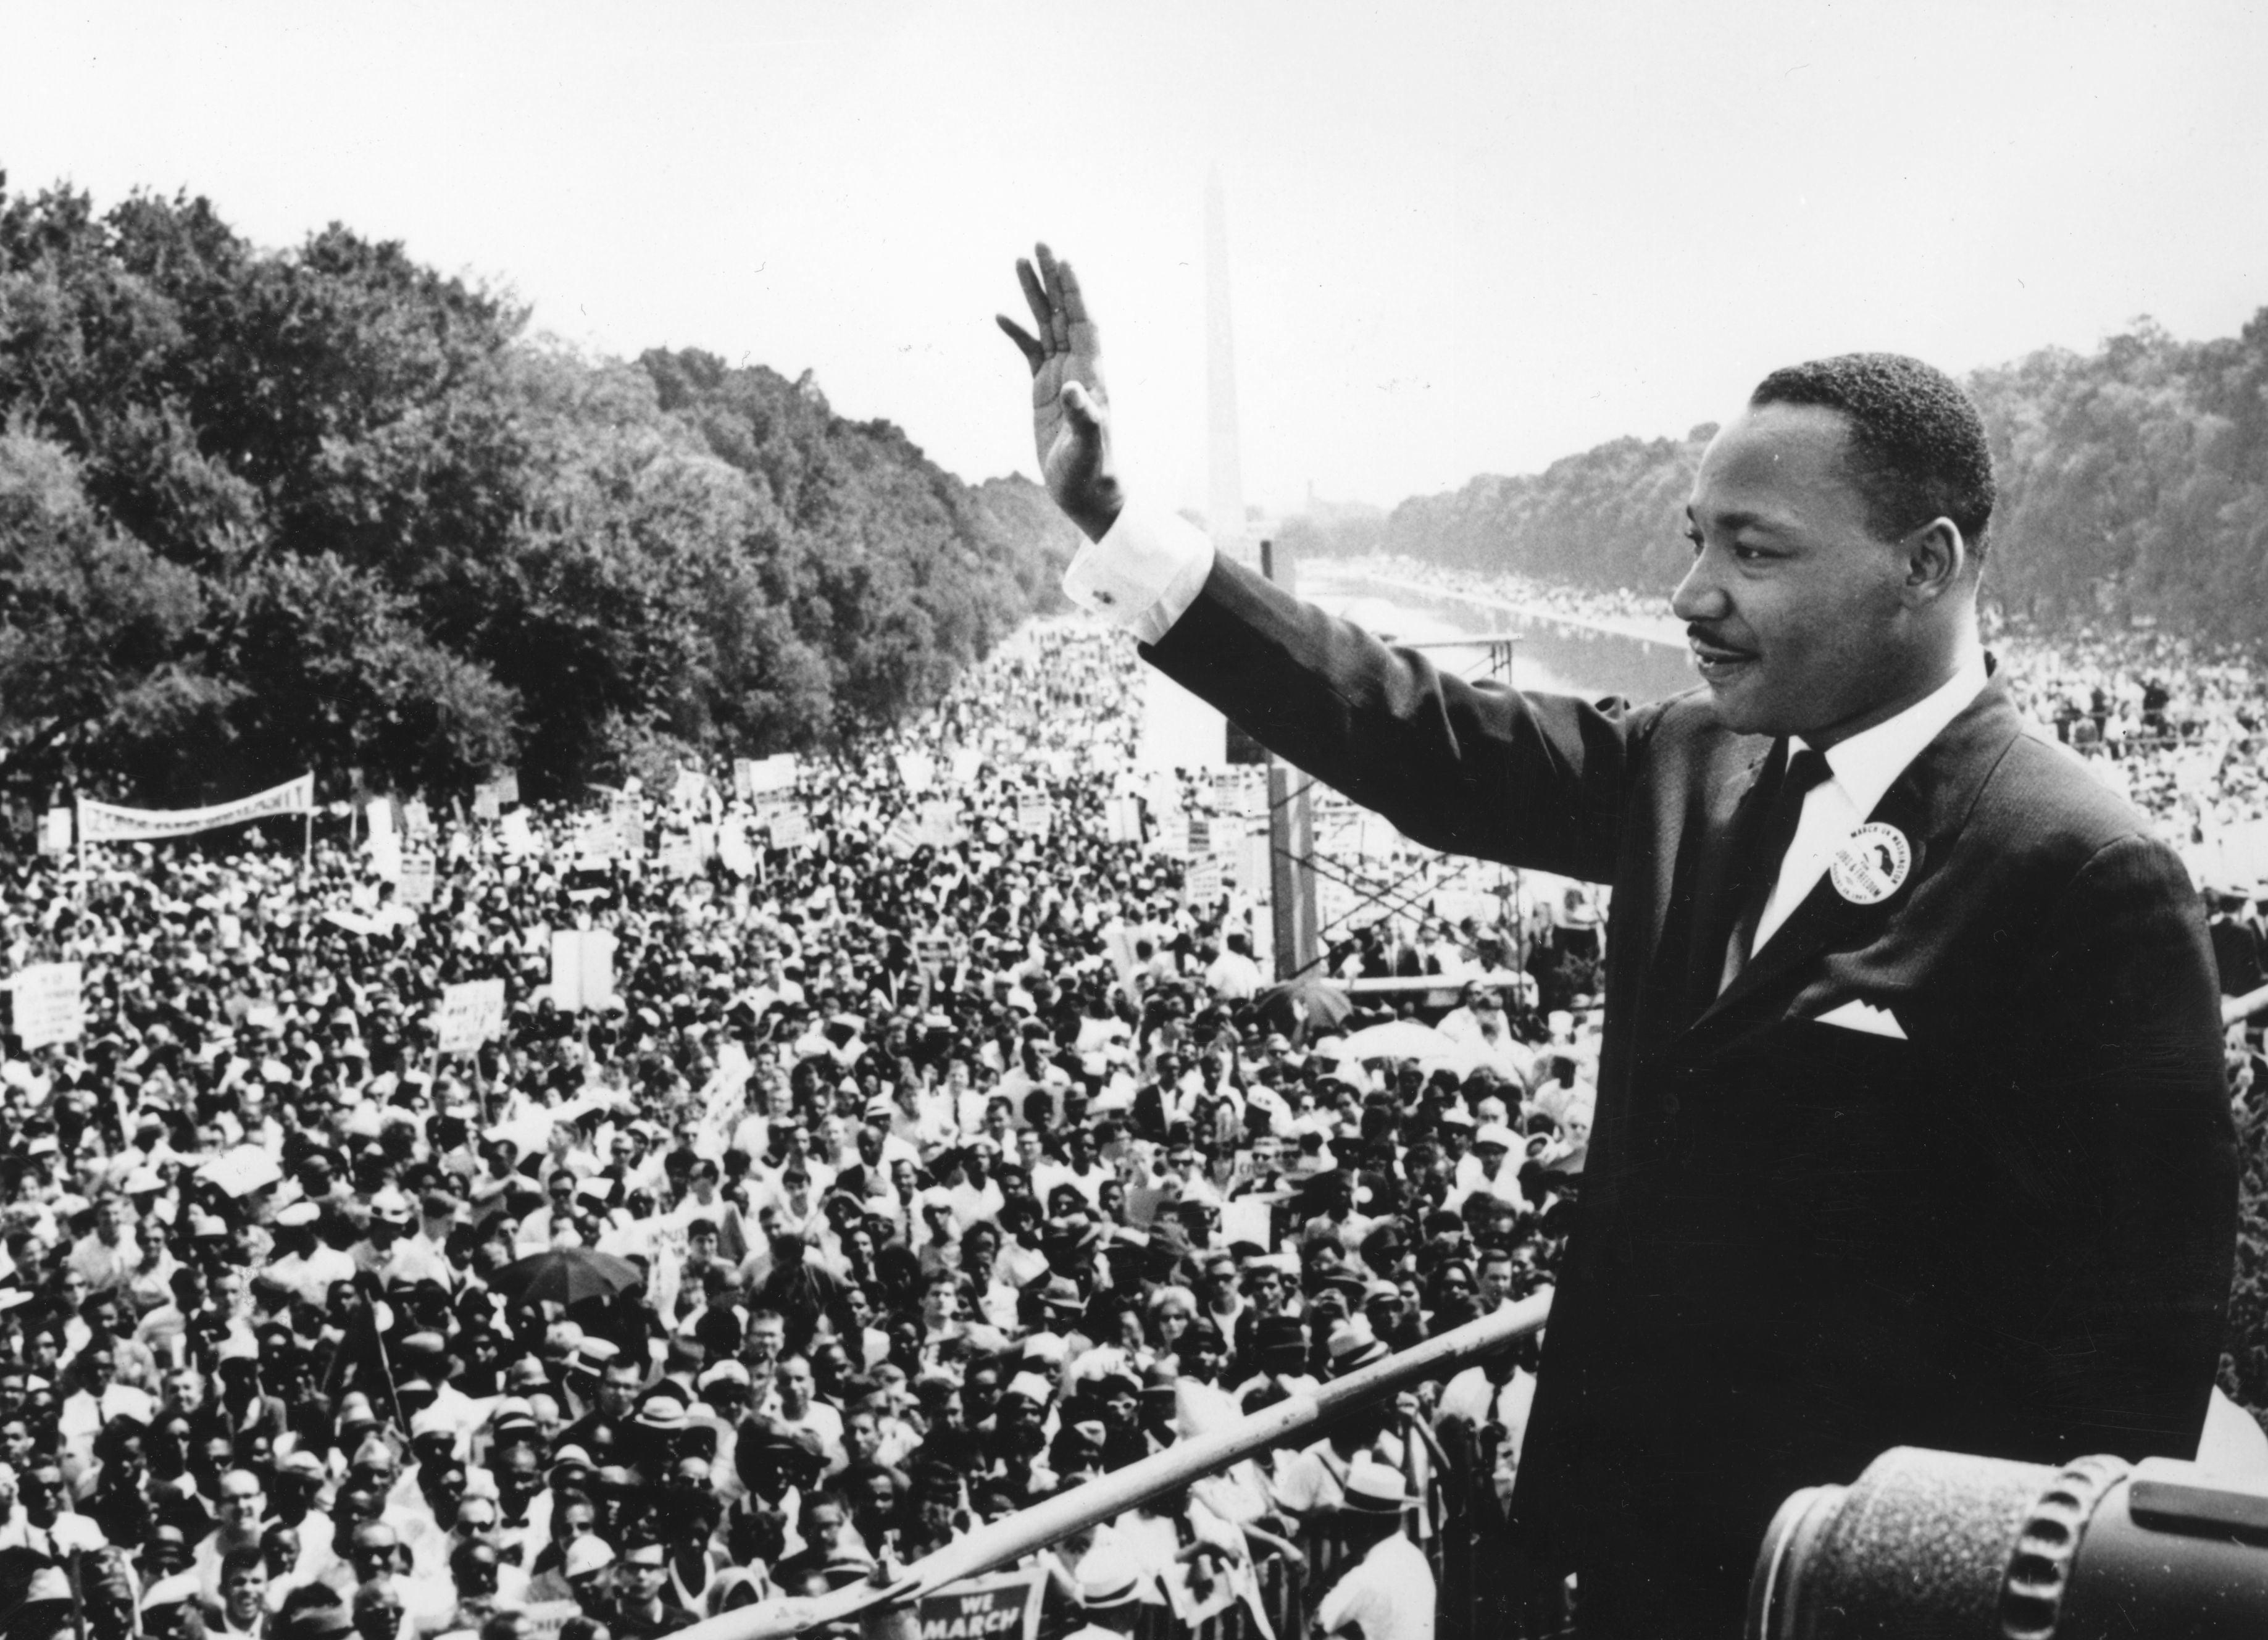 BET to Air Sunday's MLK Memorial Dedication